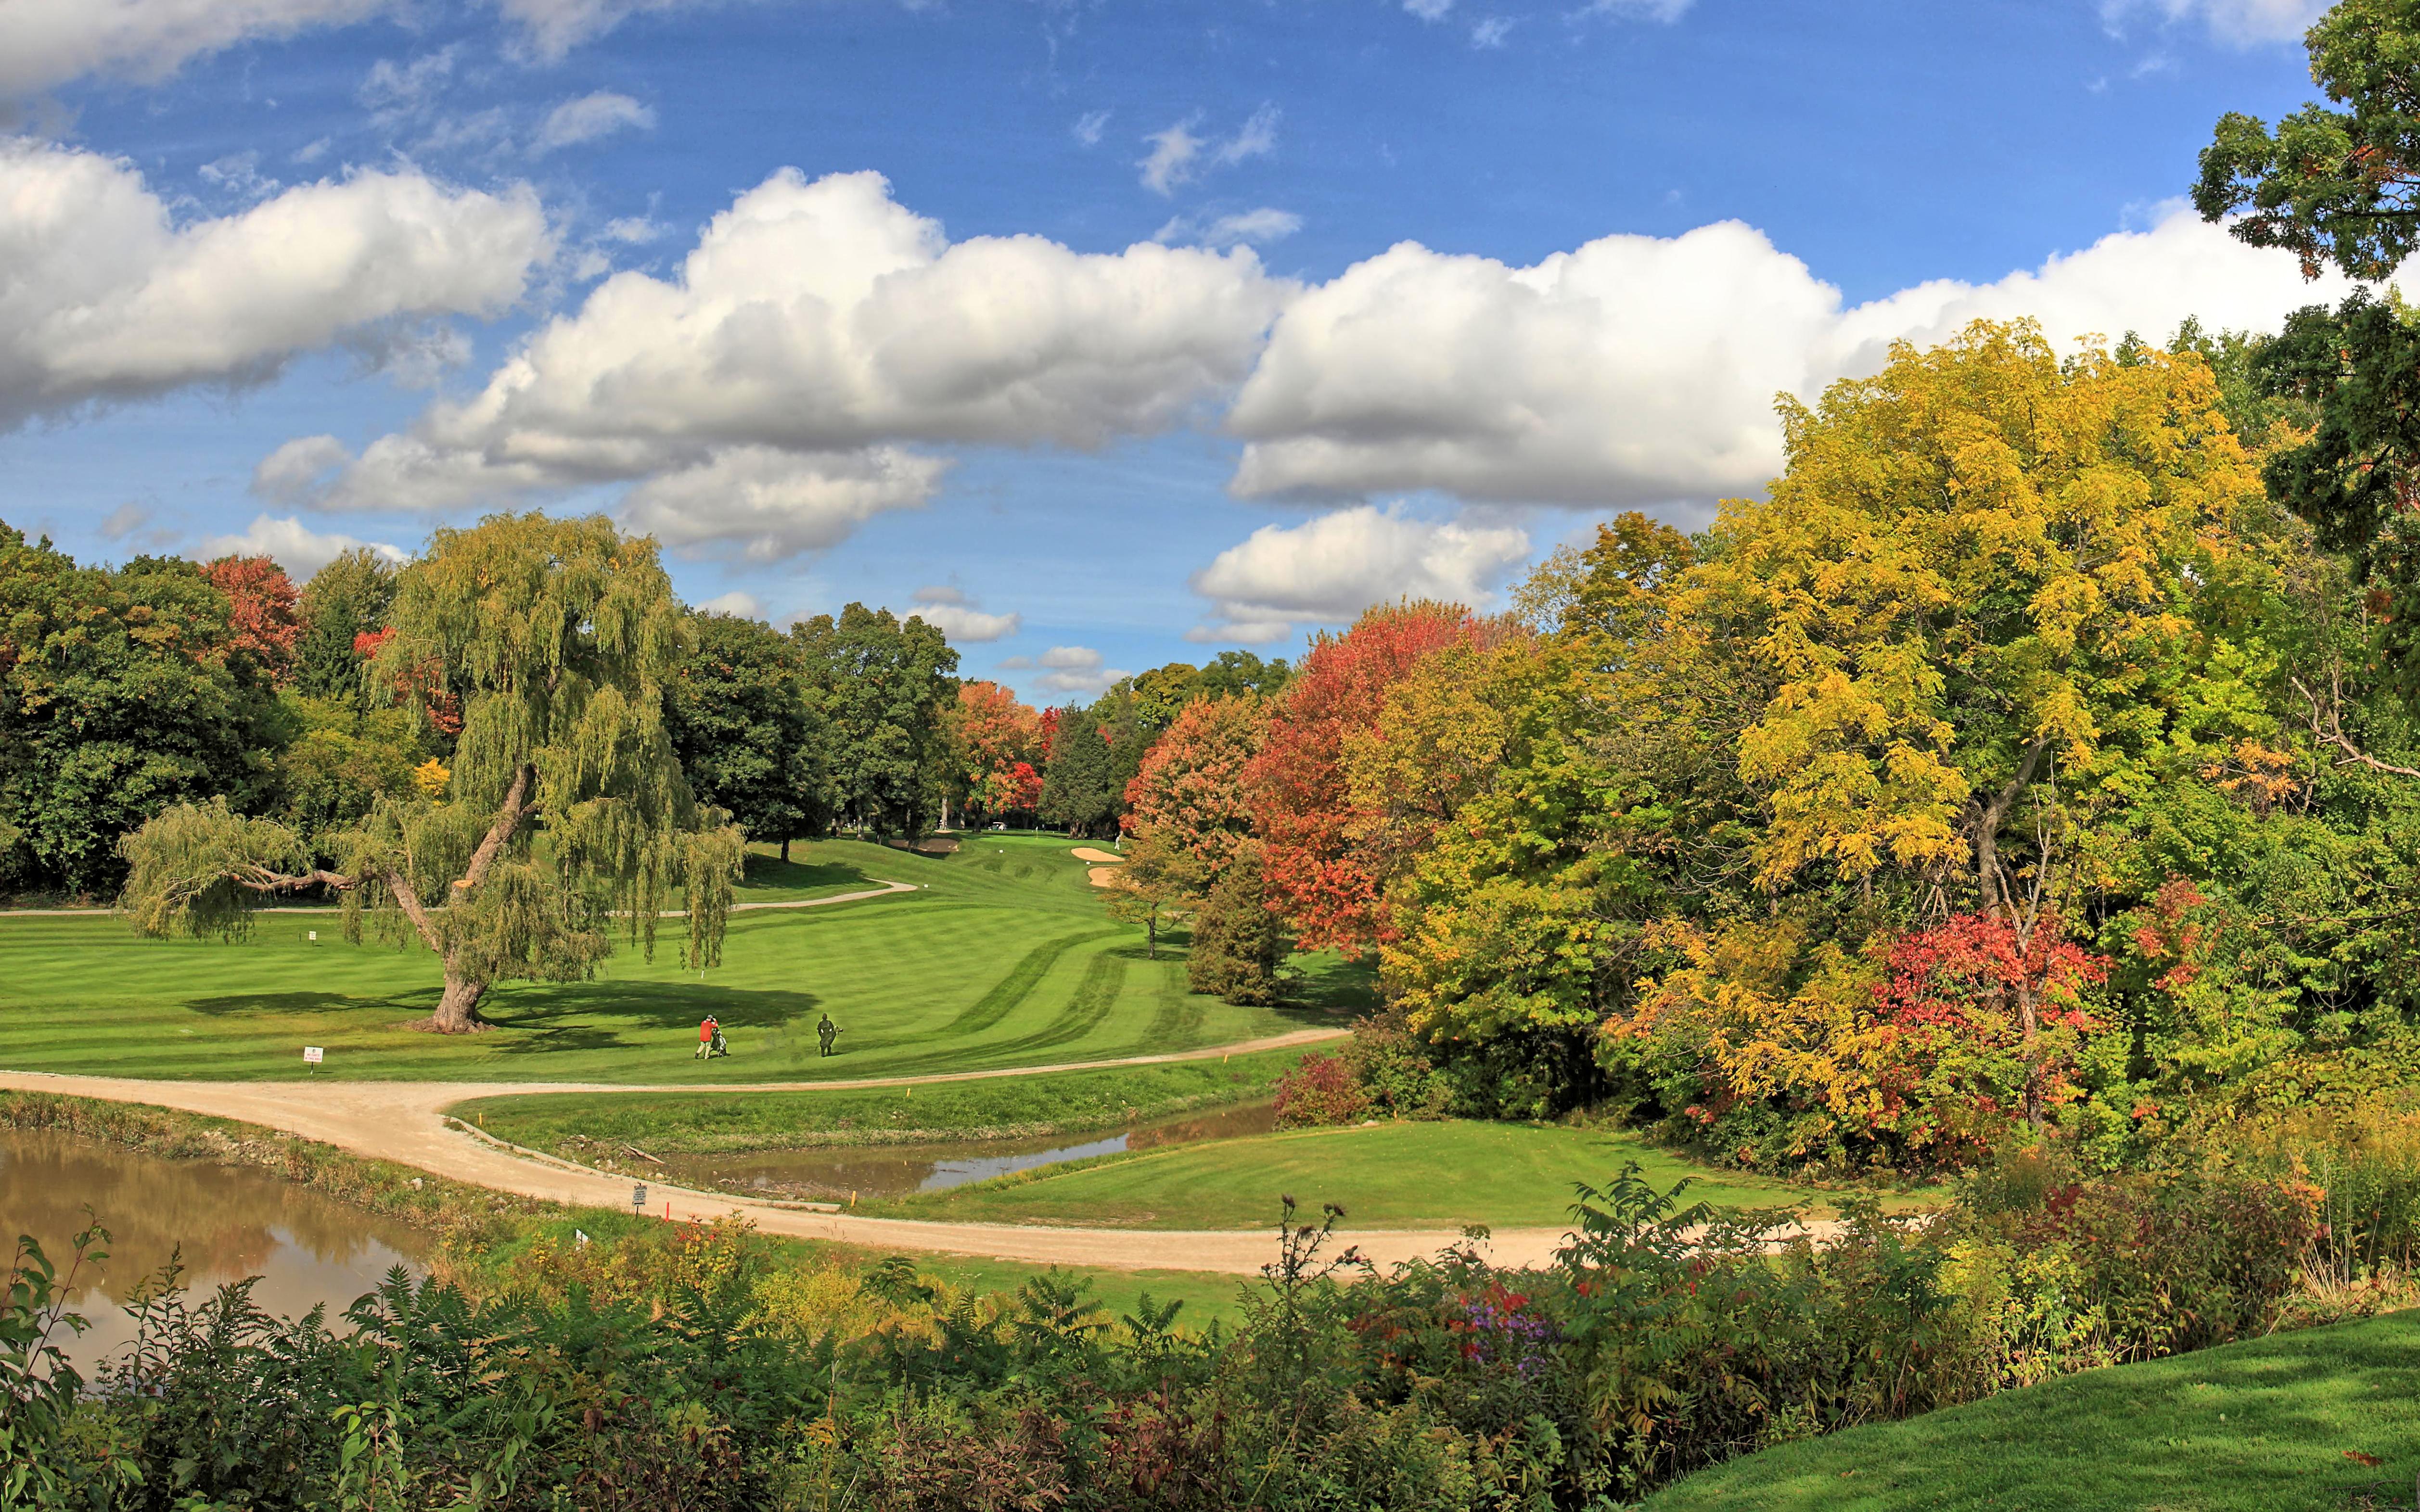 Golf Course Pano 1.jpg